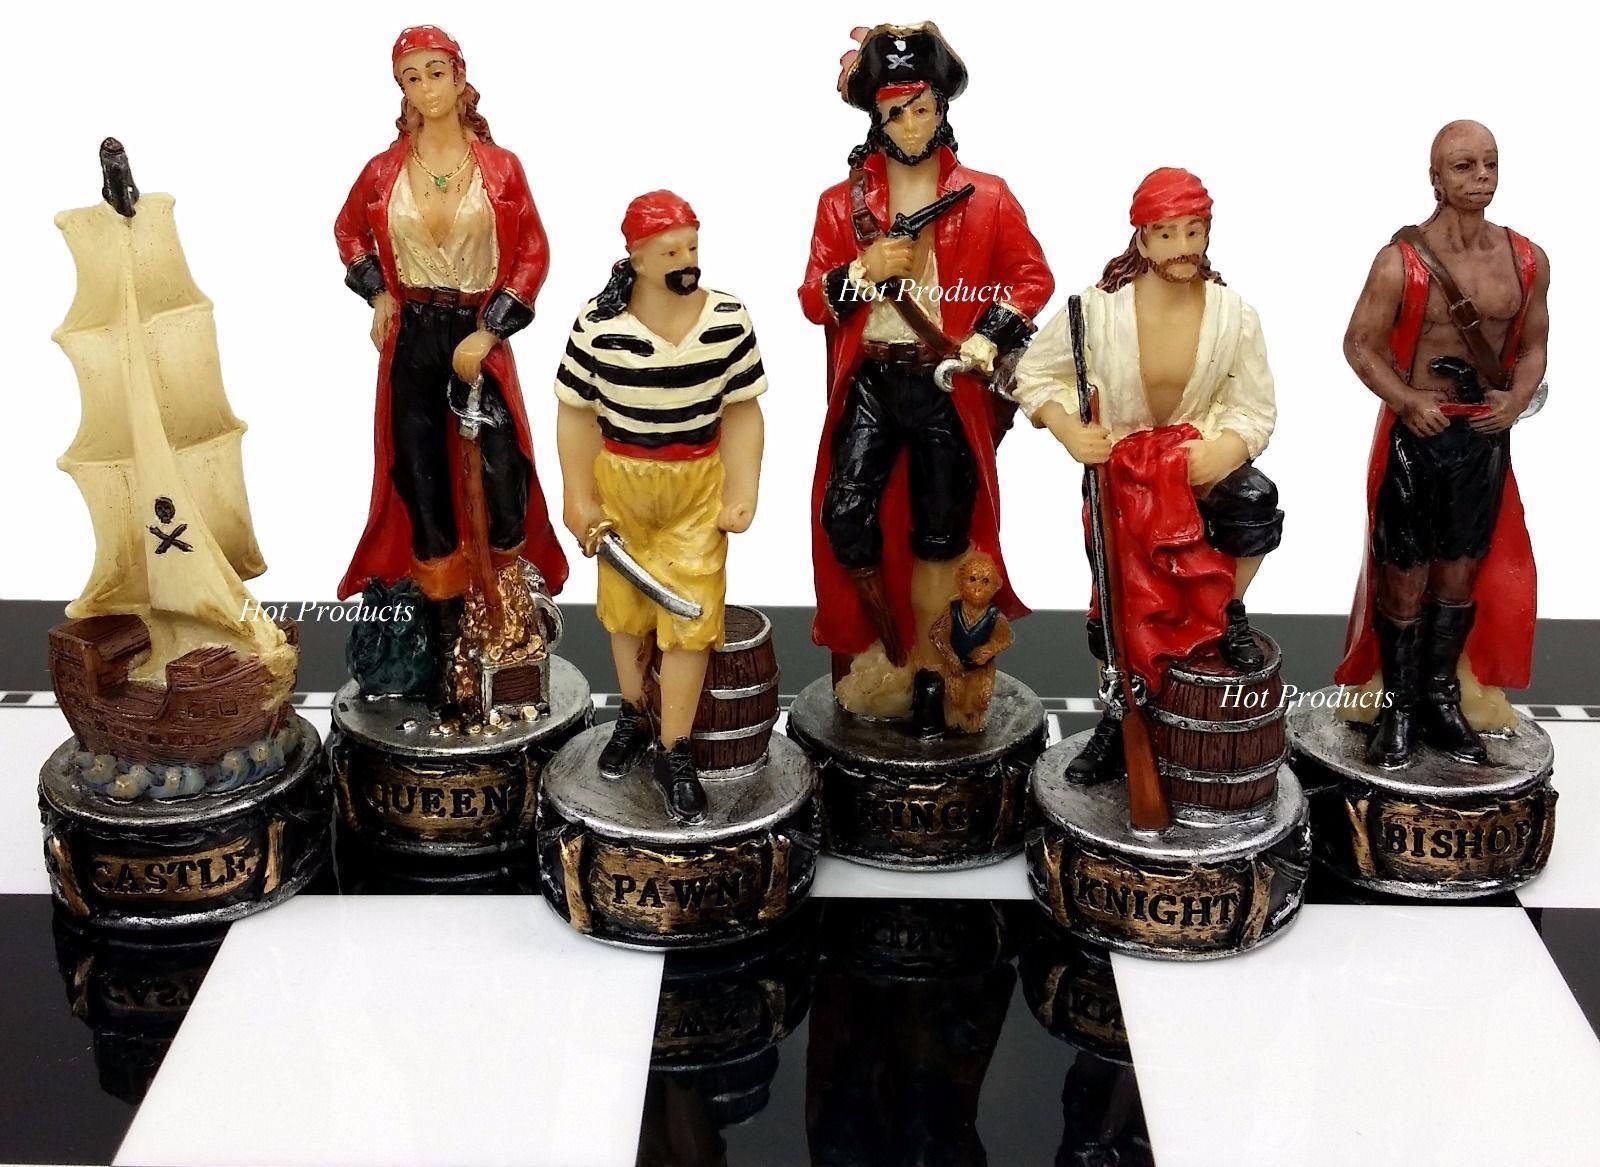 Pirates Vs Royal Navy Pirate Chess Uomo Set - NO BOARD